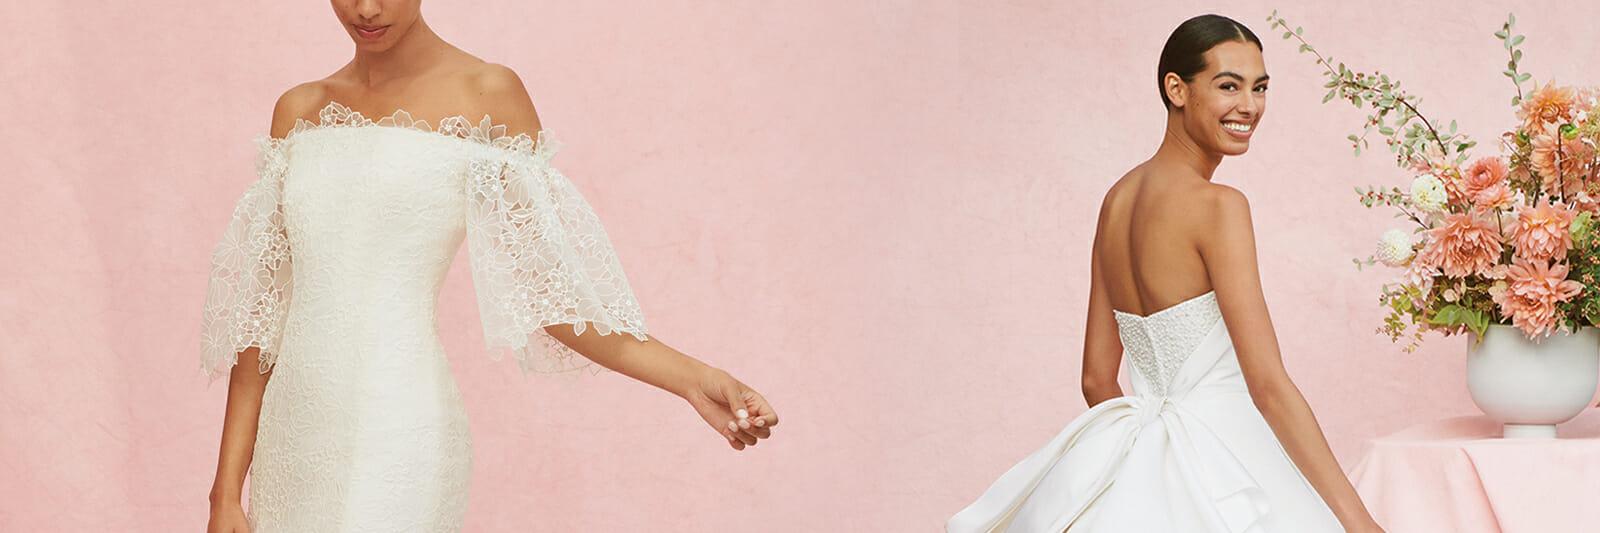 Bridal Collection Trunk Shows Carolina Herrera